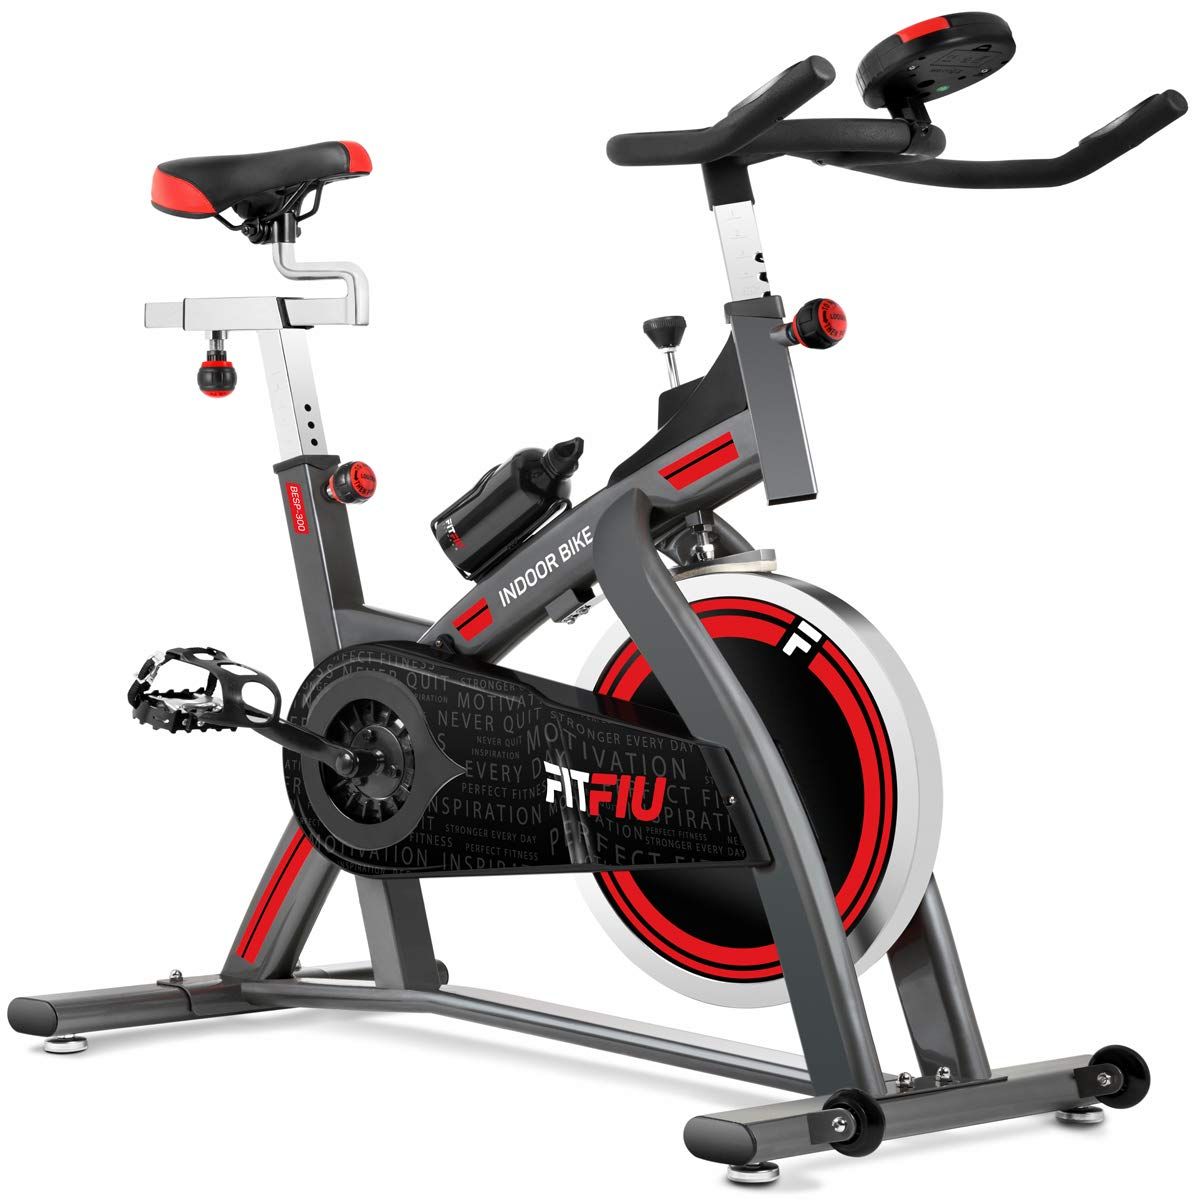 FITFIU Fitness BESP-300 Bicicleta Spinning BESP-24 Profesional ...